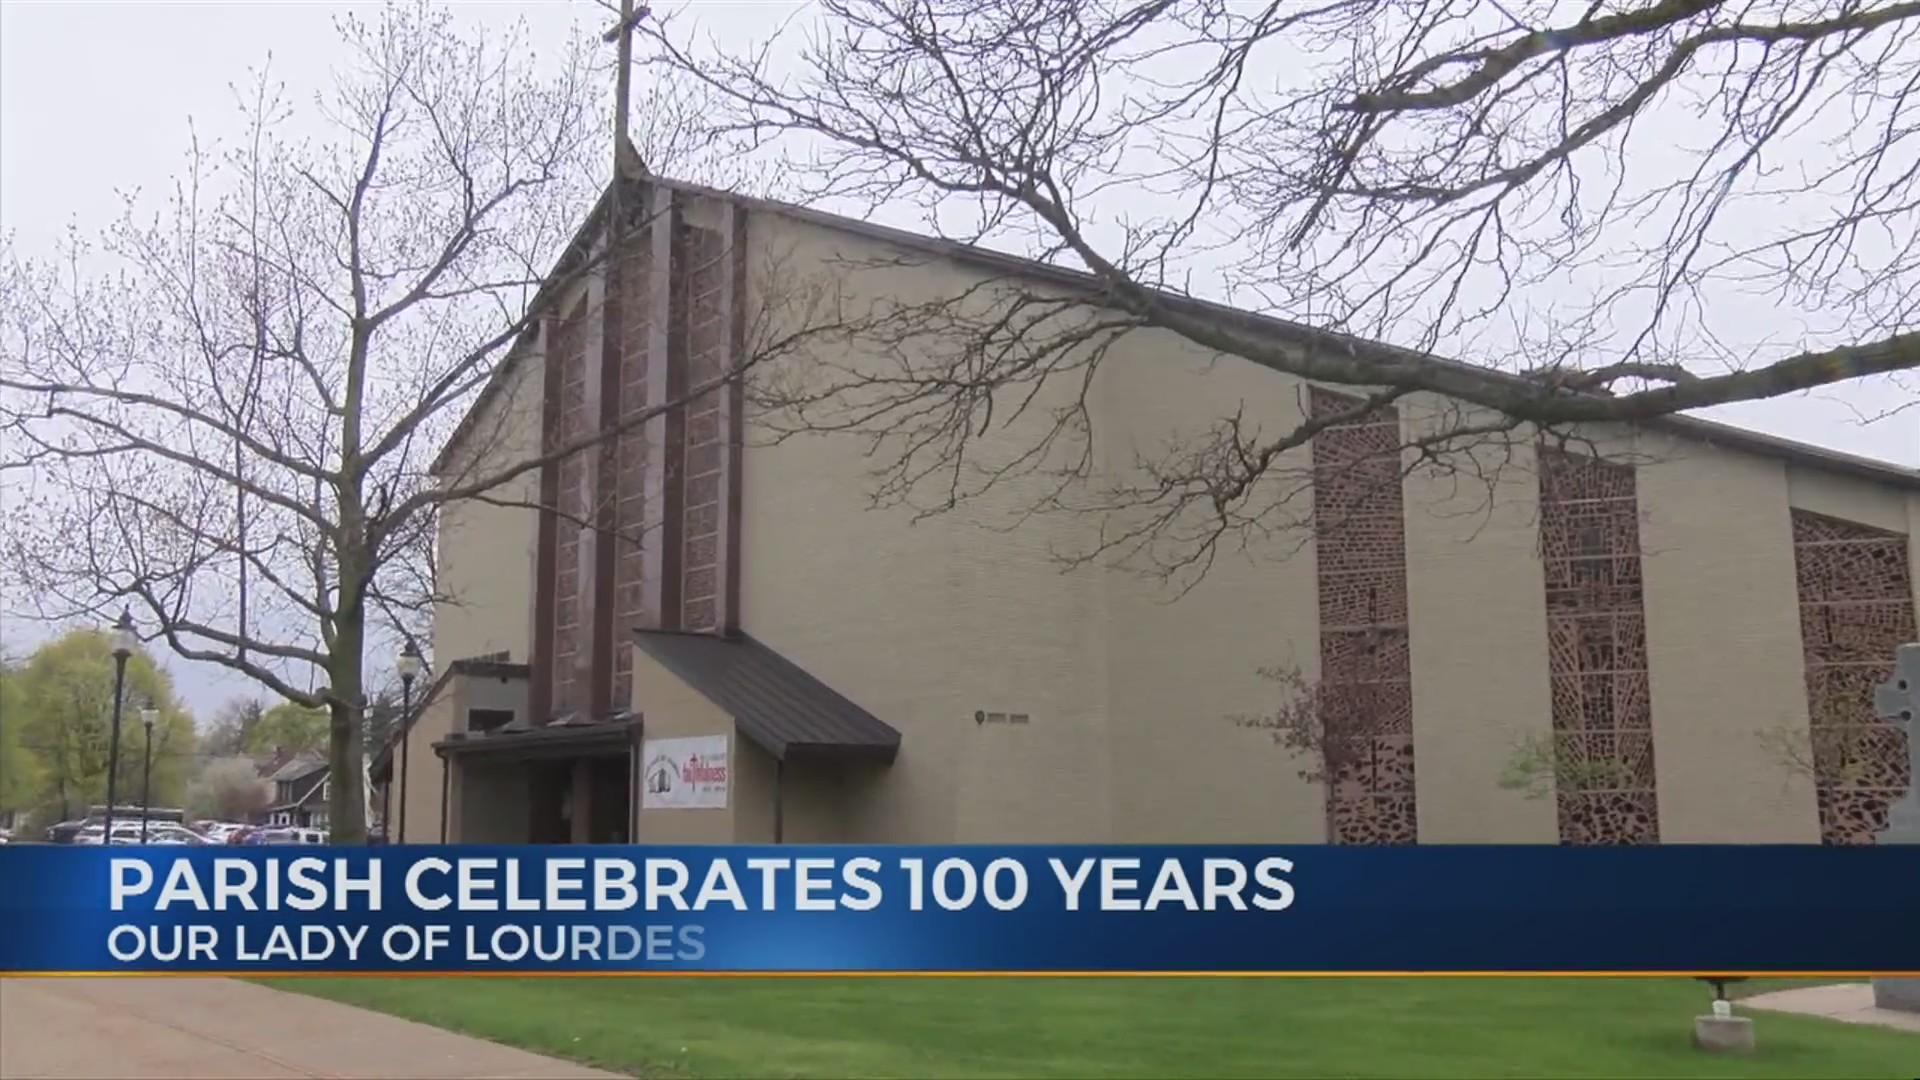 Parish Celebrates 100 Years